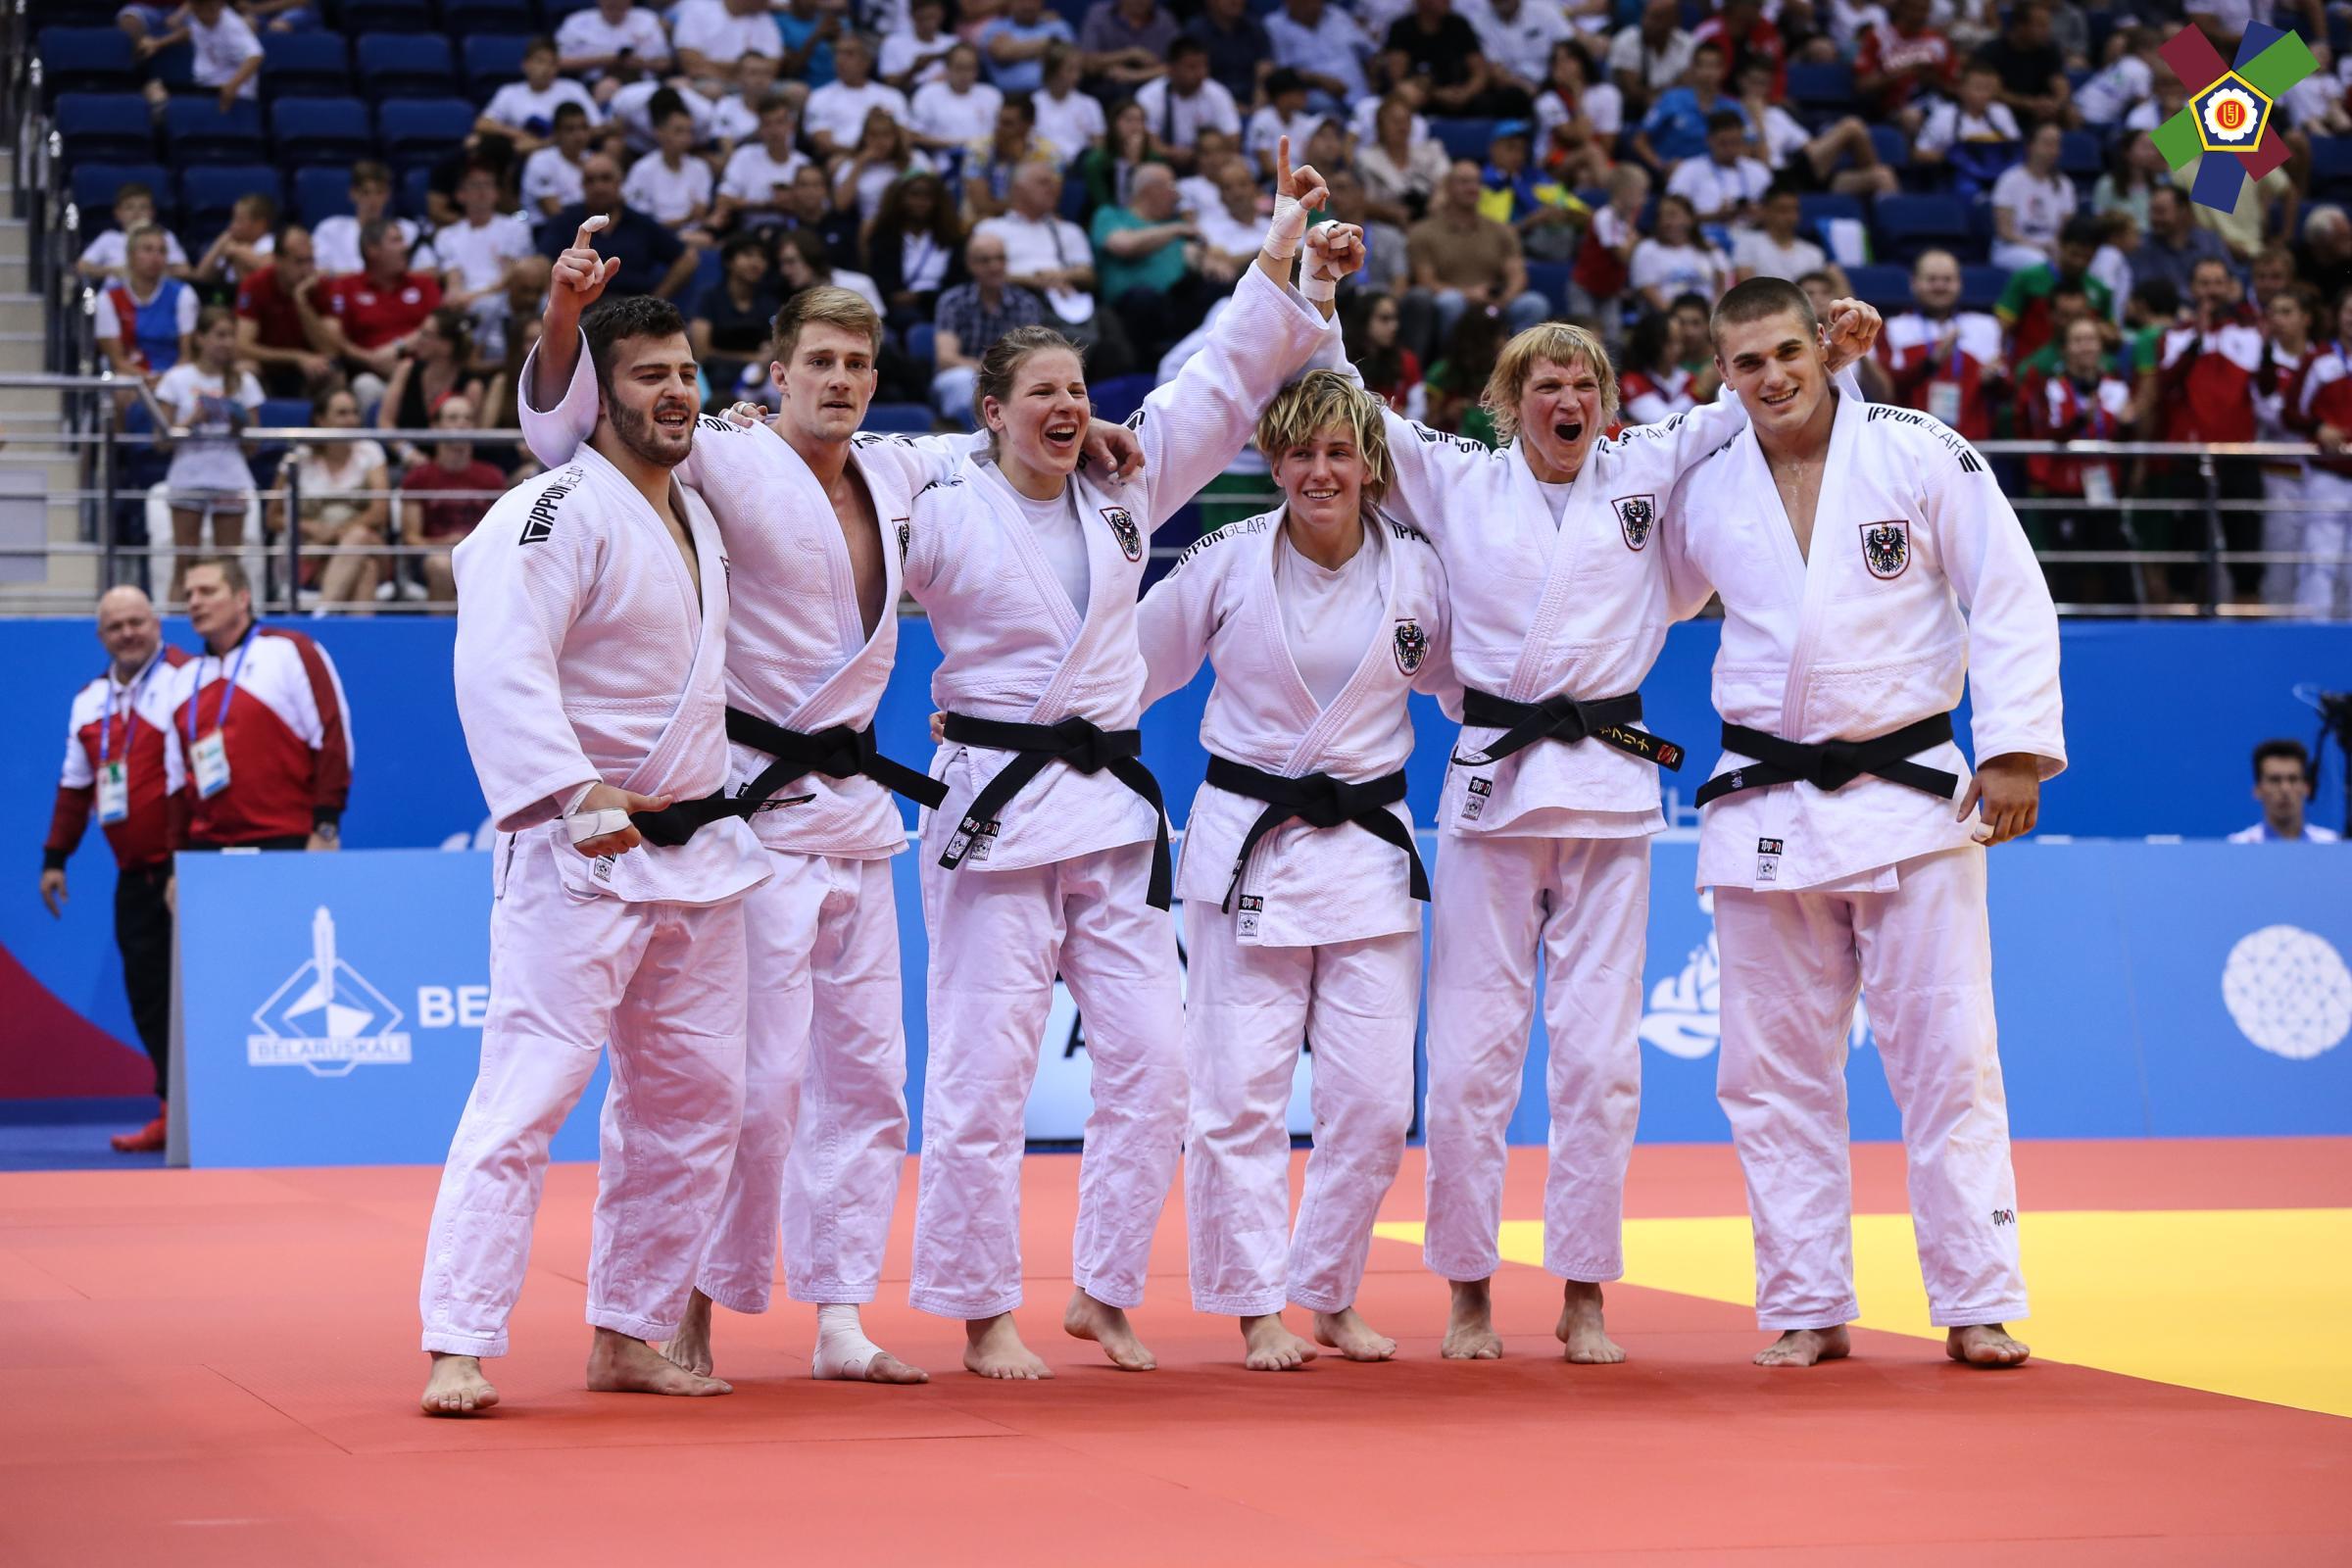 EJU-Senior-European-Games-European-Championships-2019-Austria-1